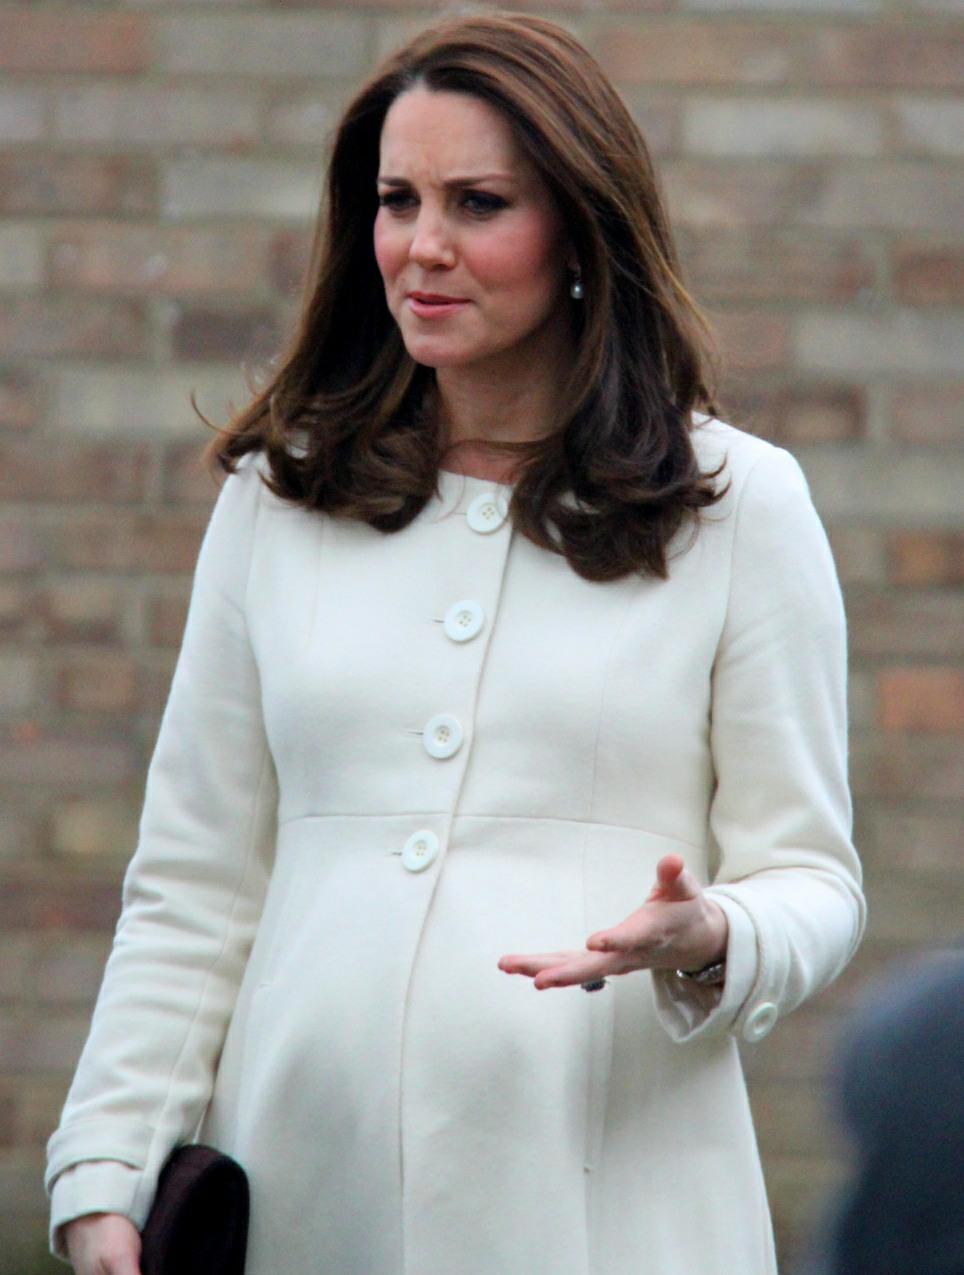 Catherine Duchess of Cambridge visits Pegasus Primary School in Oxford